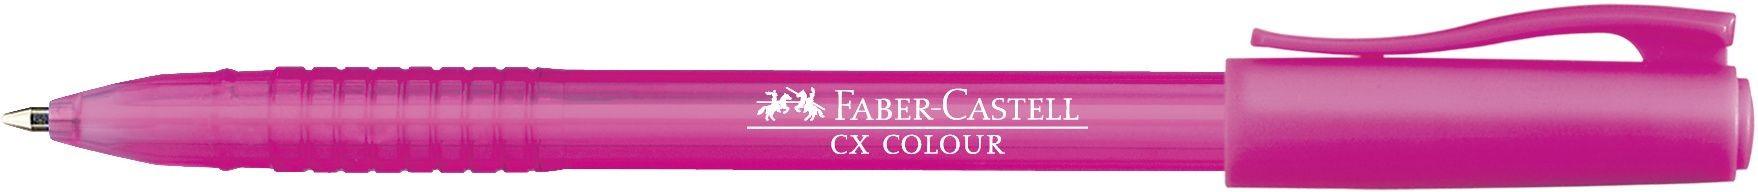 ROLLER 1MM SEMI-GEL CX COLOUR ROZ FABER-CASTELL